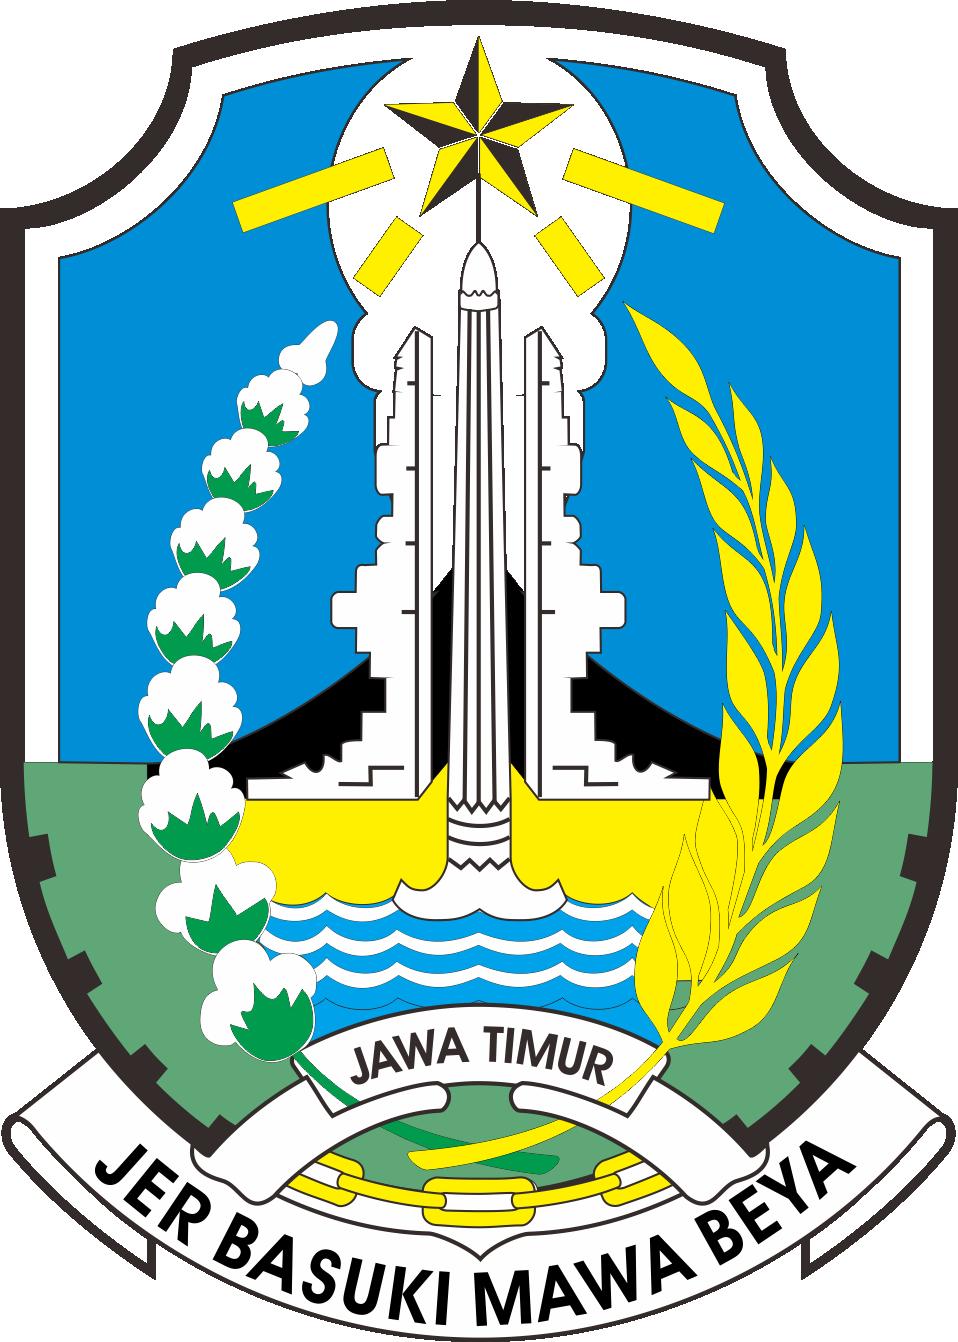 16 Jawa Timur Kota Pendidikan